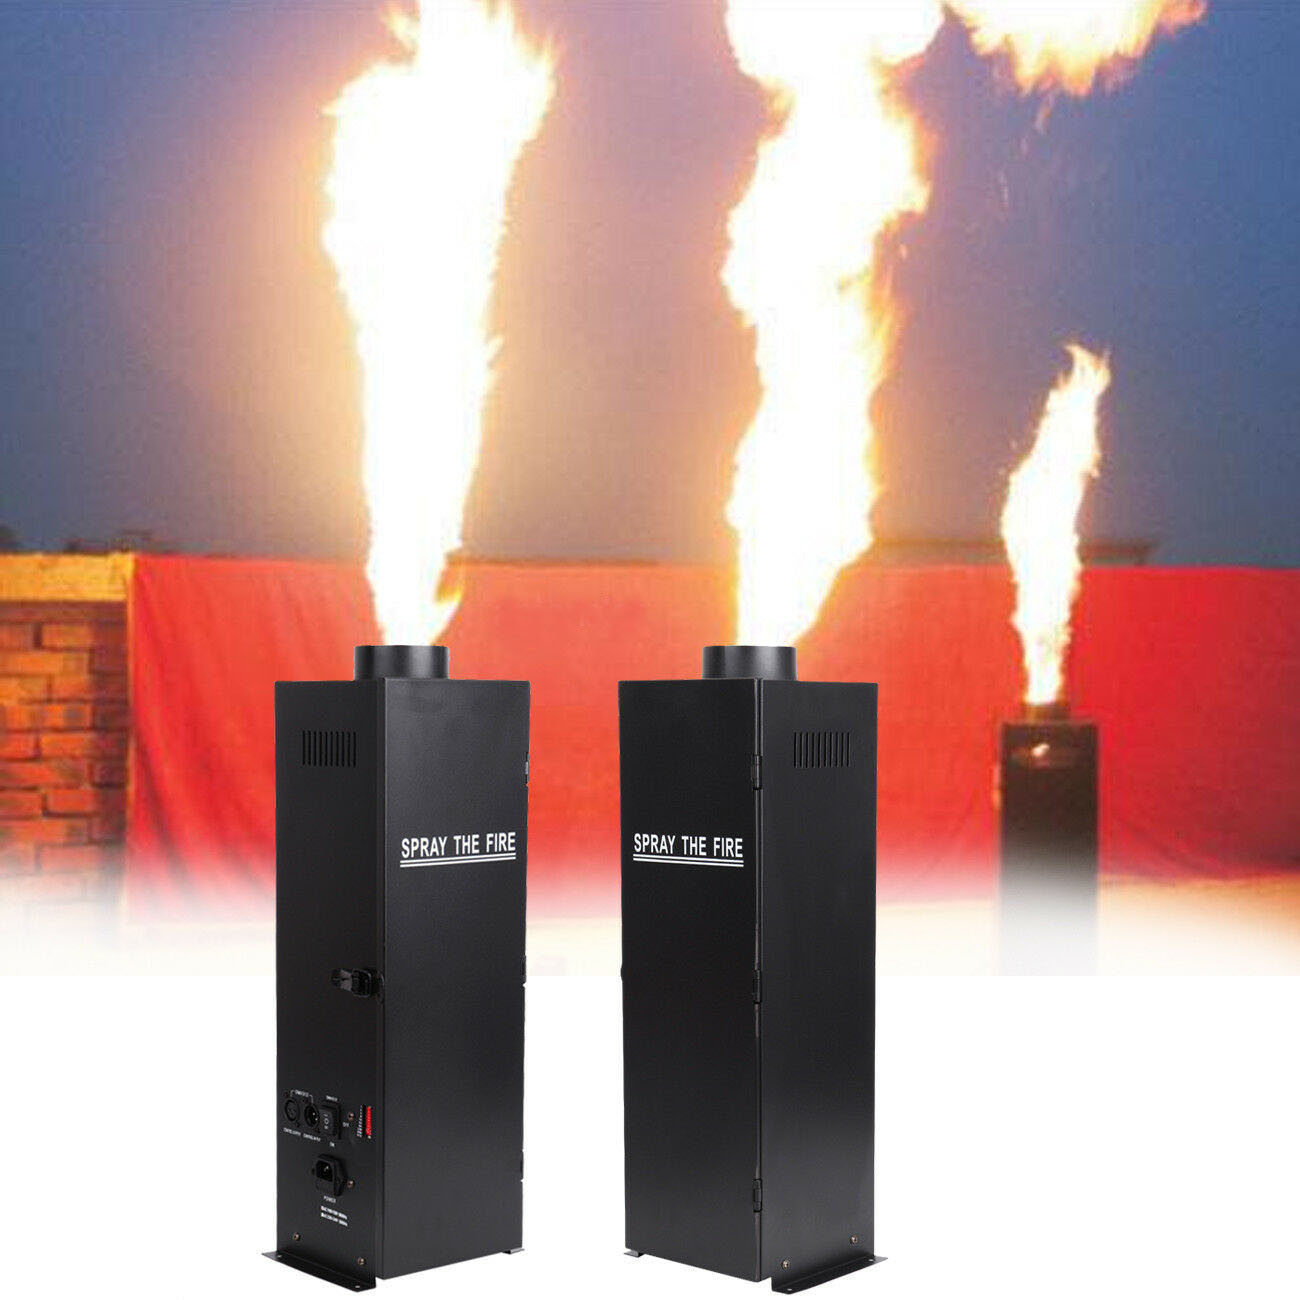 2 pcs/lot 200W Fire Spraying Machine Effect Flame DMX Launcher DJ Band Scene Fuel Fire Machine